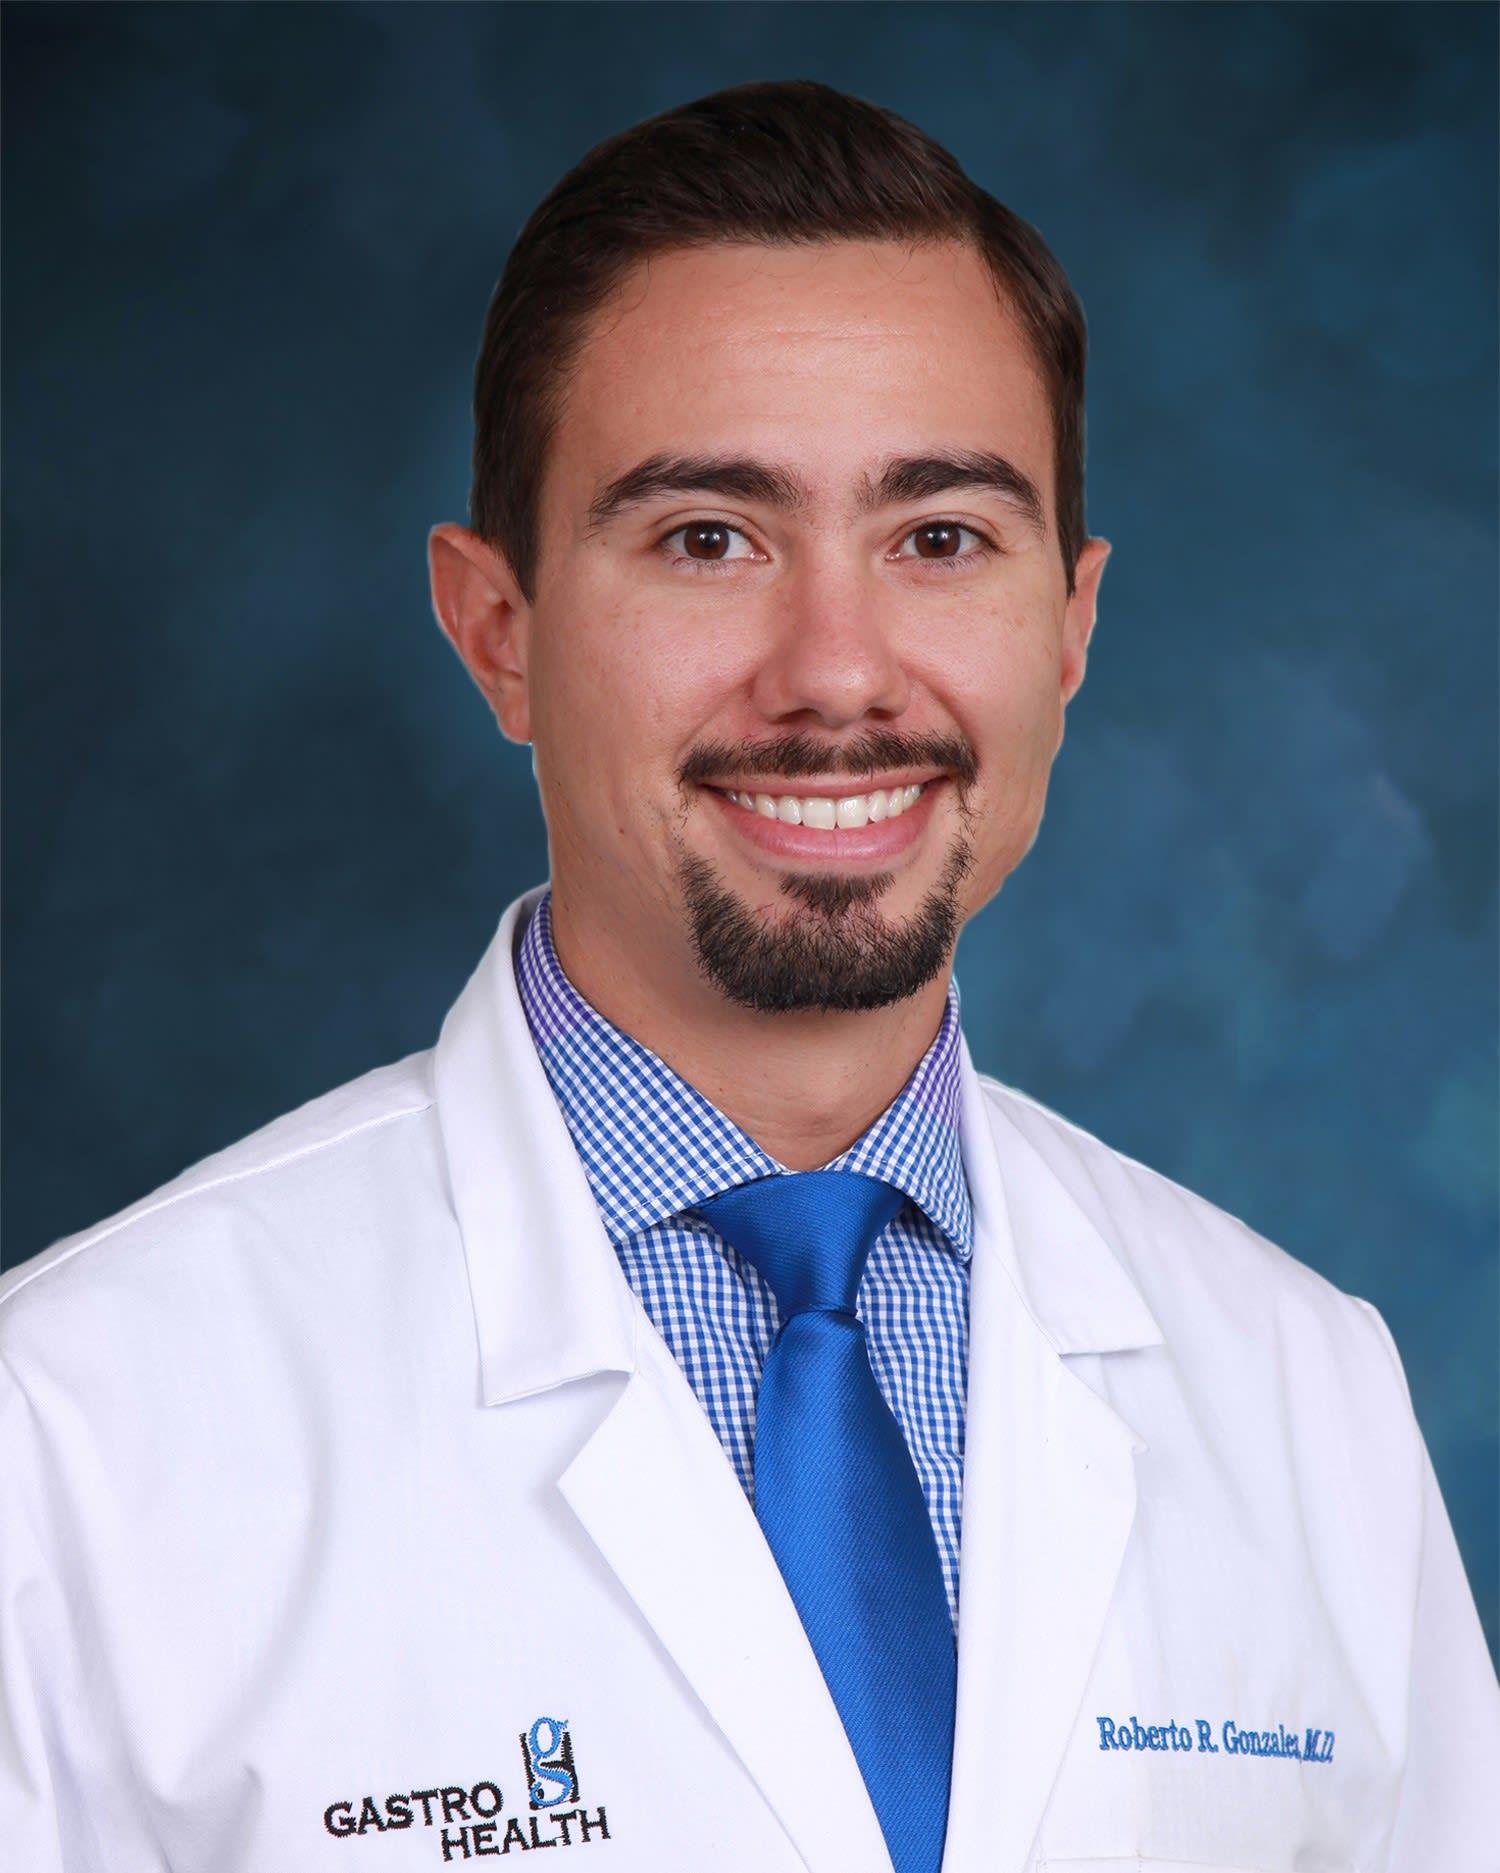 Roberto R Gonzalez, MD Family Medicine